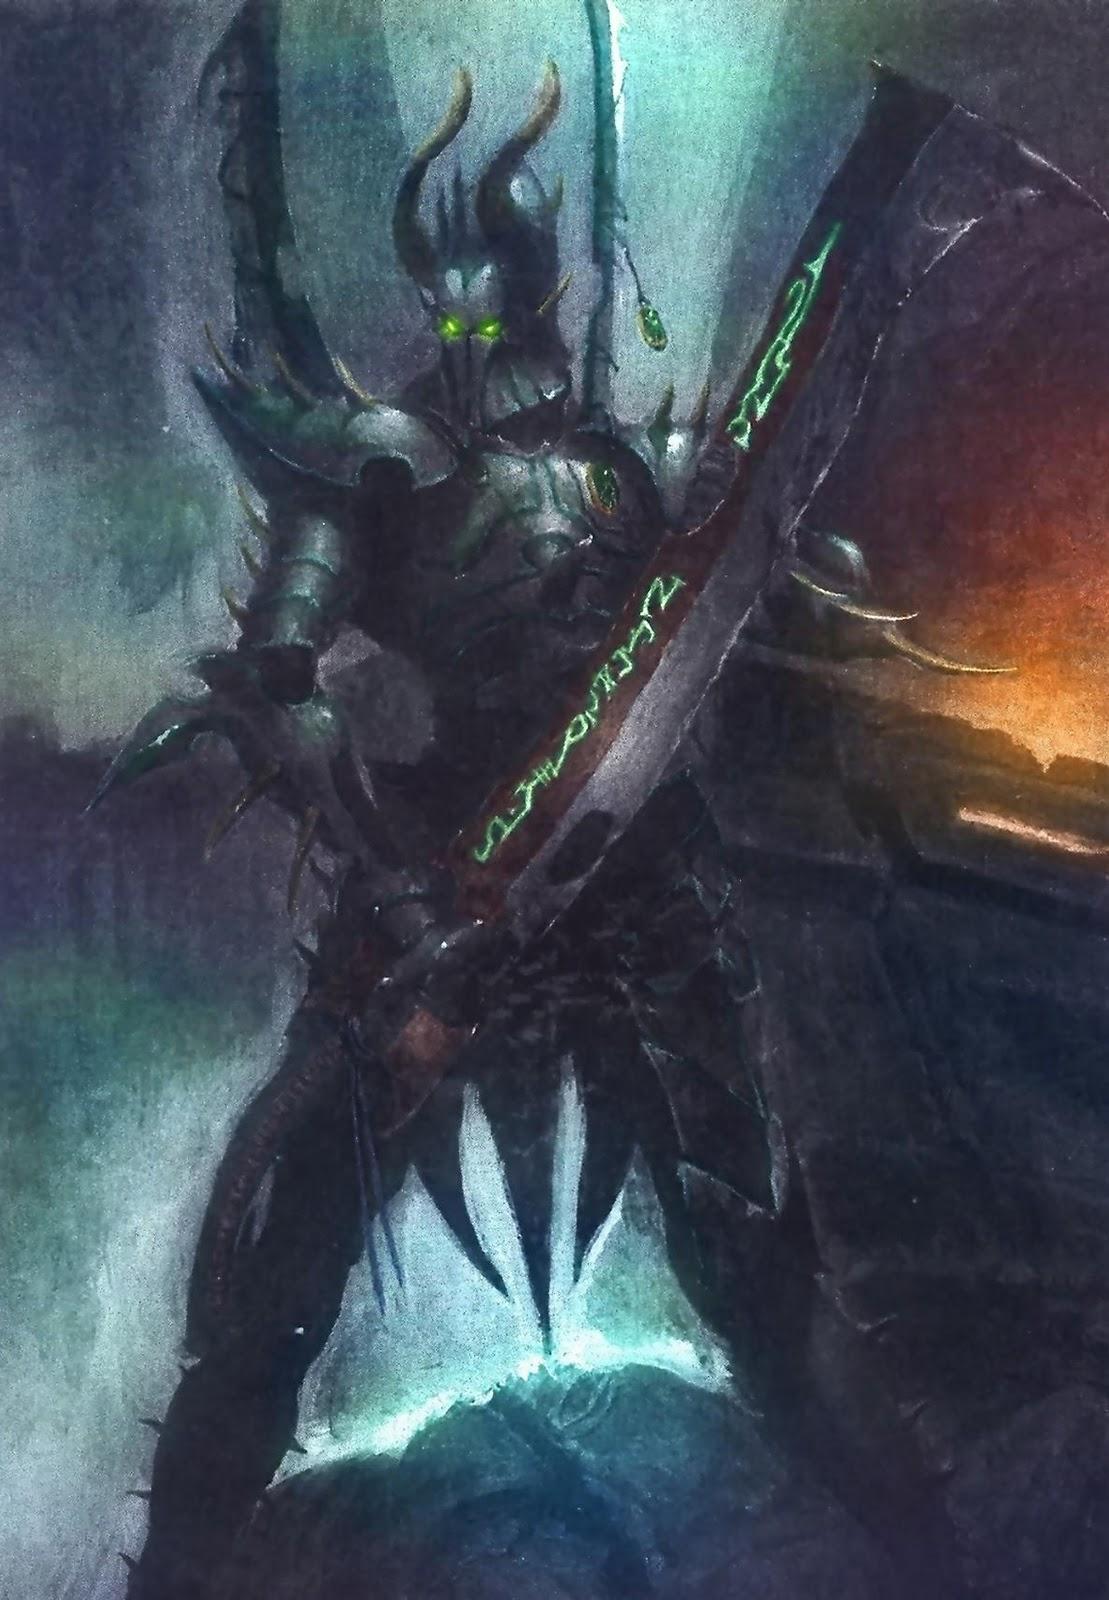 #058 - The Black Cabal Incubi2_e